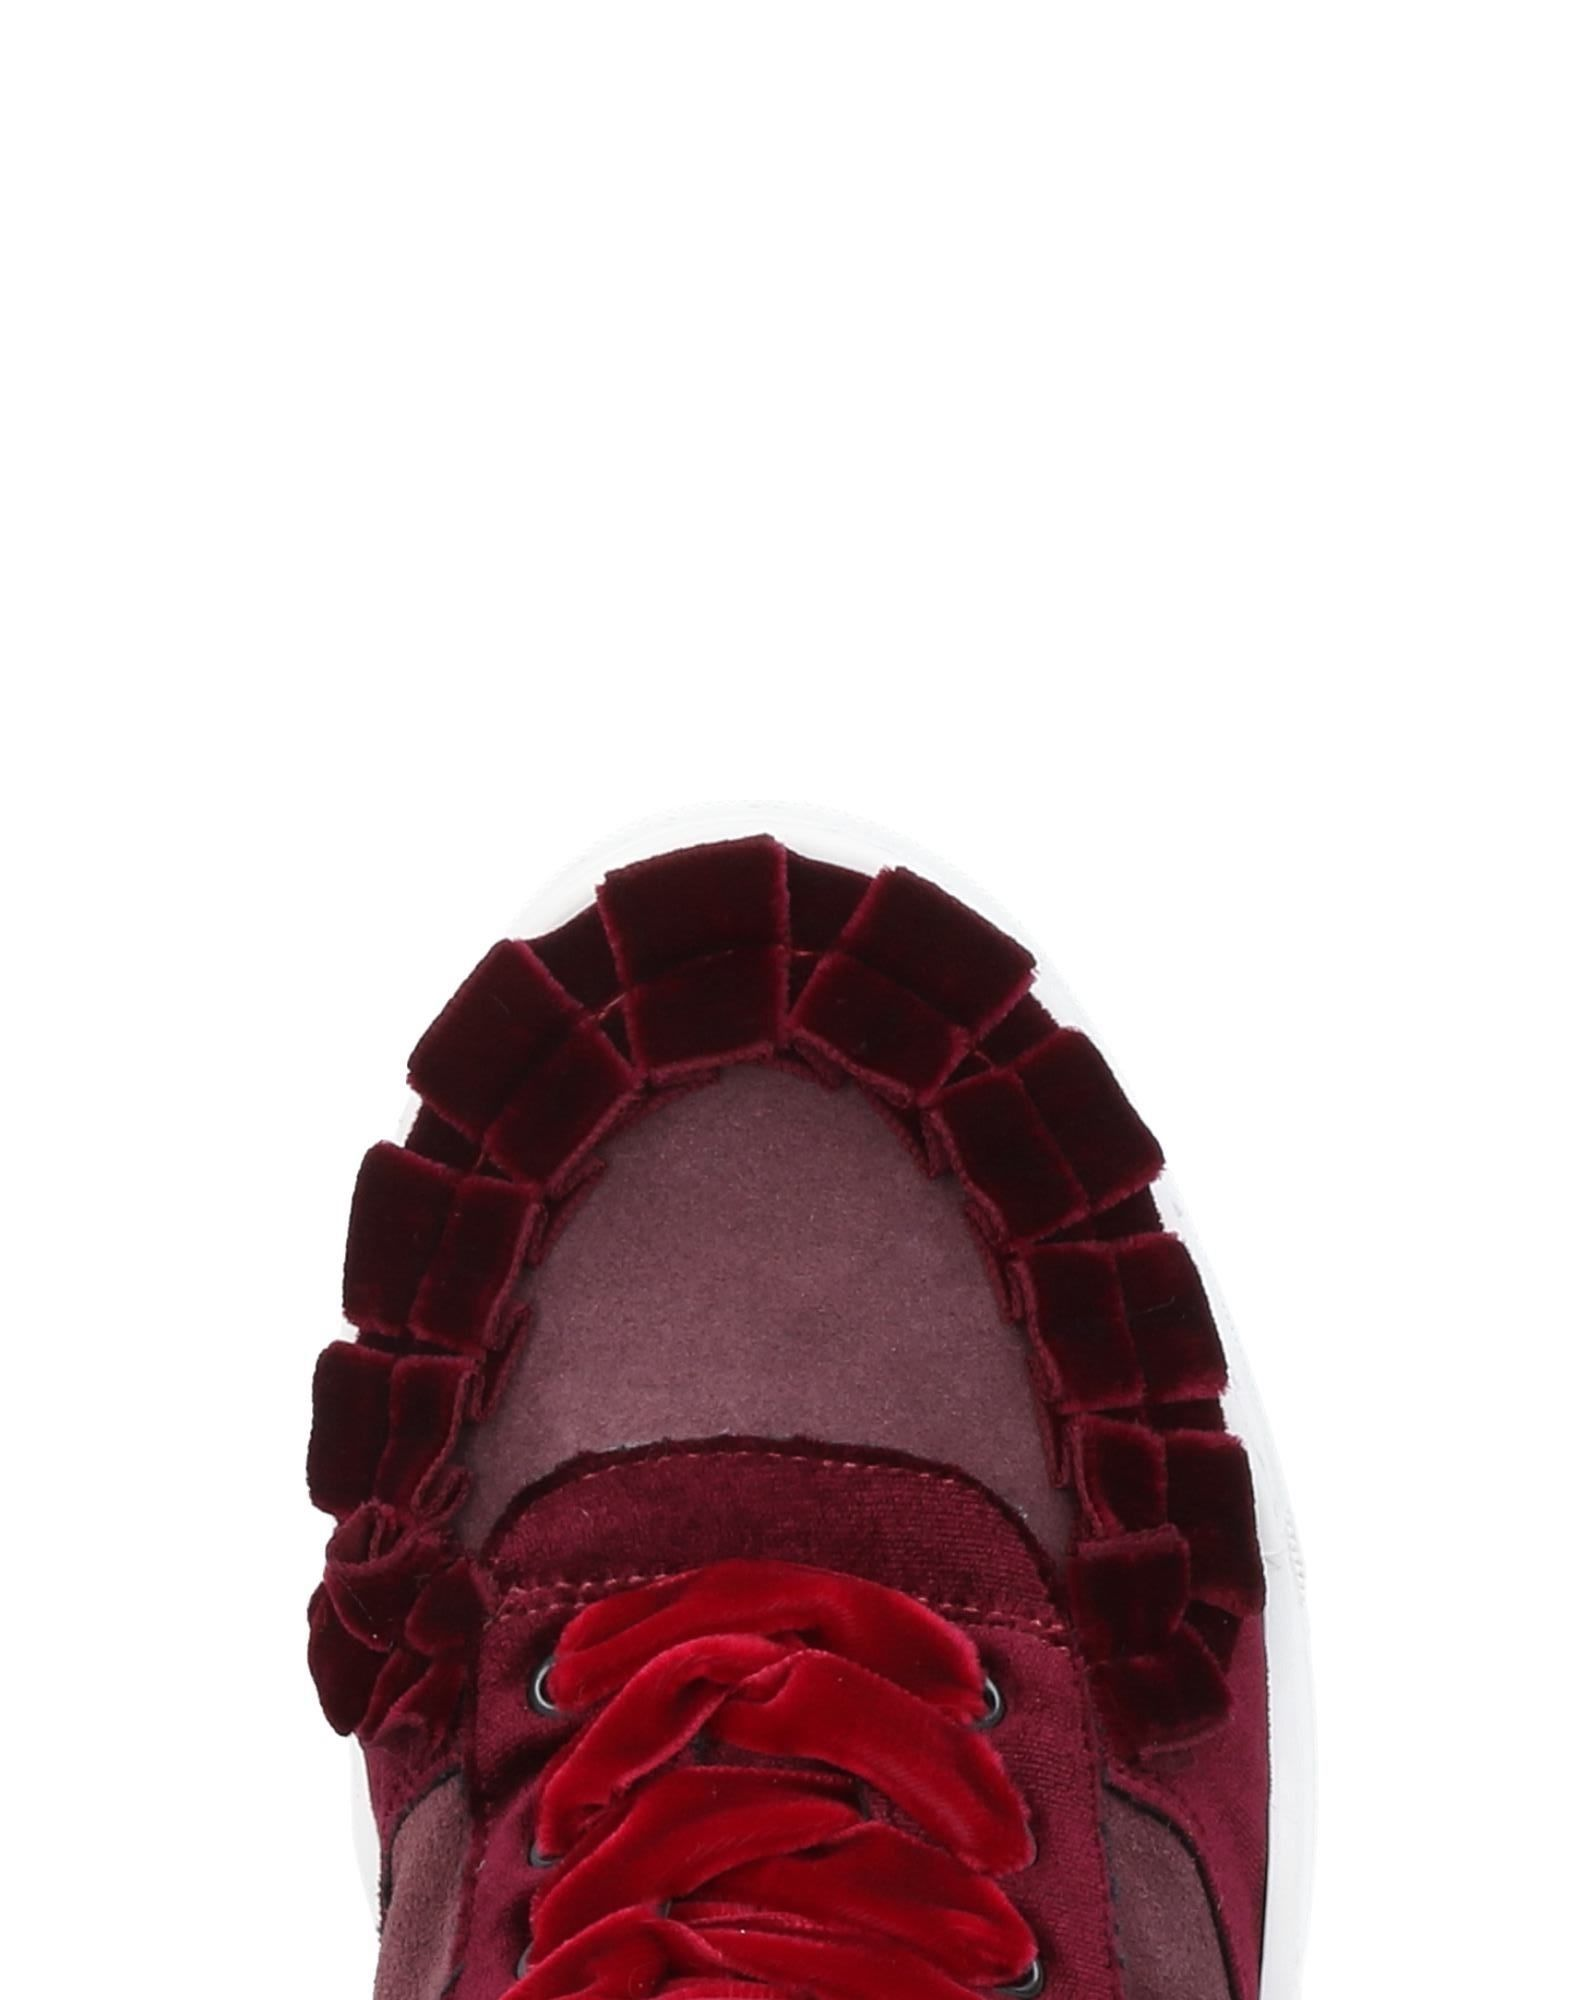 Tipe E Tacchi Sneakers lohnt Damen Gutes Preis-Leistungs-Verhältnis, es lohnt Sneakers sich 5cc1ae